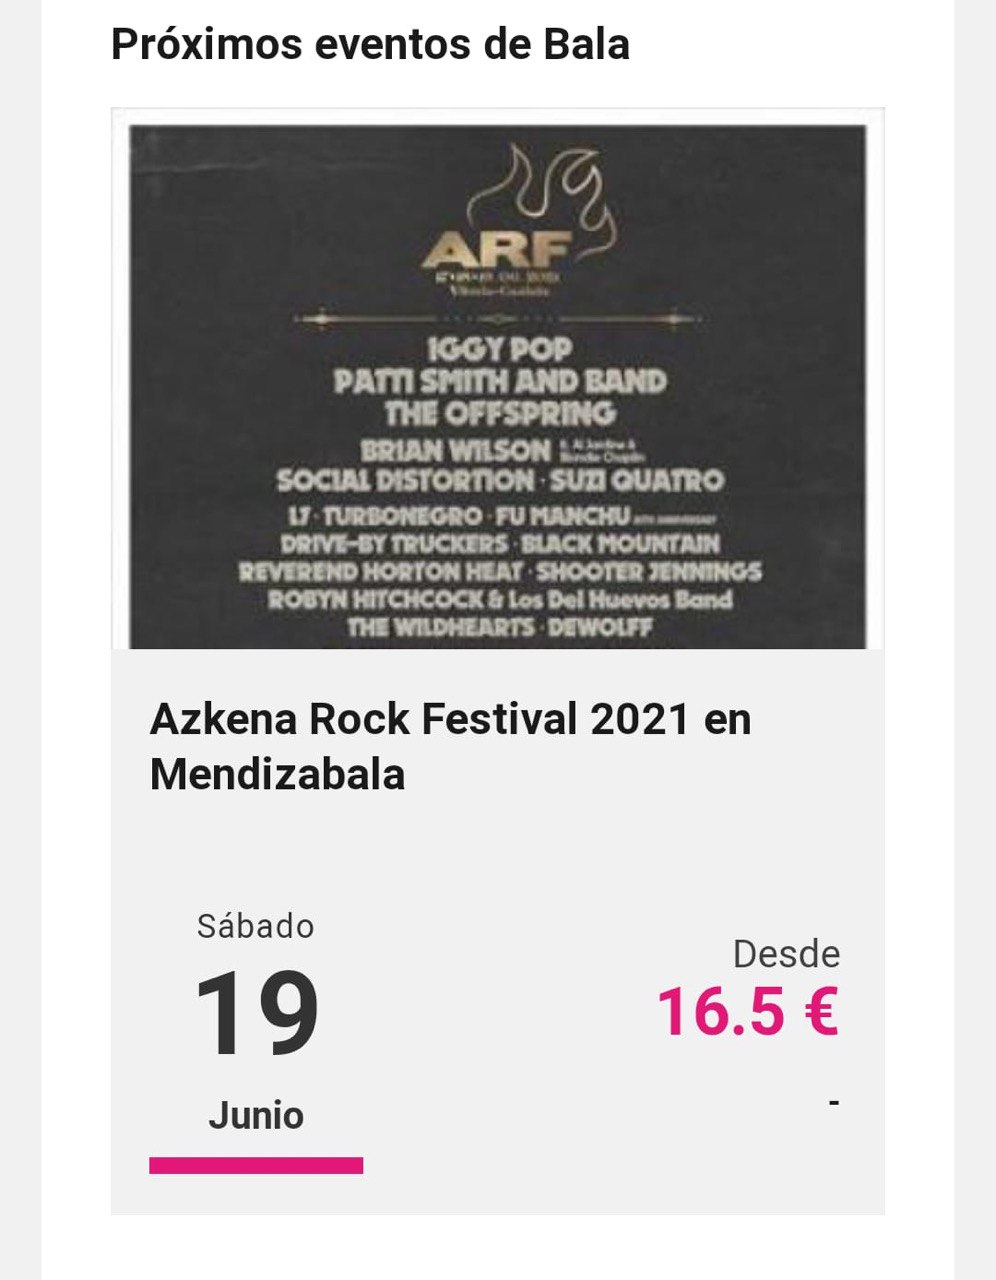 Azkena Rock Festival 2022. Daniel Romano - Página 8 M17